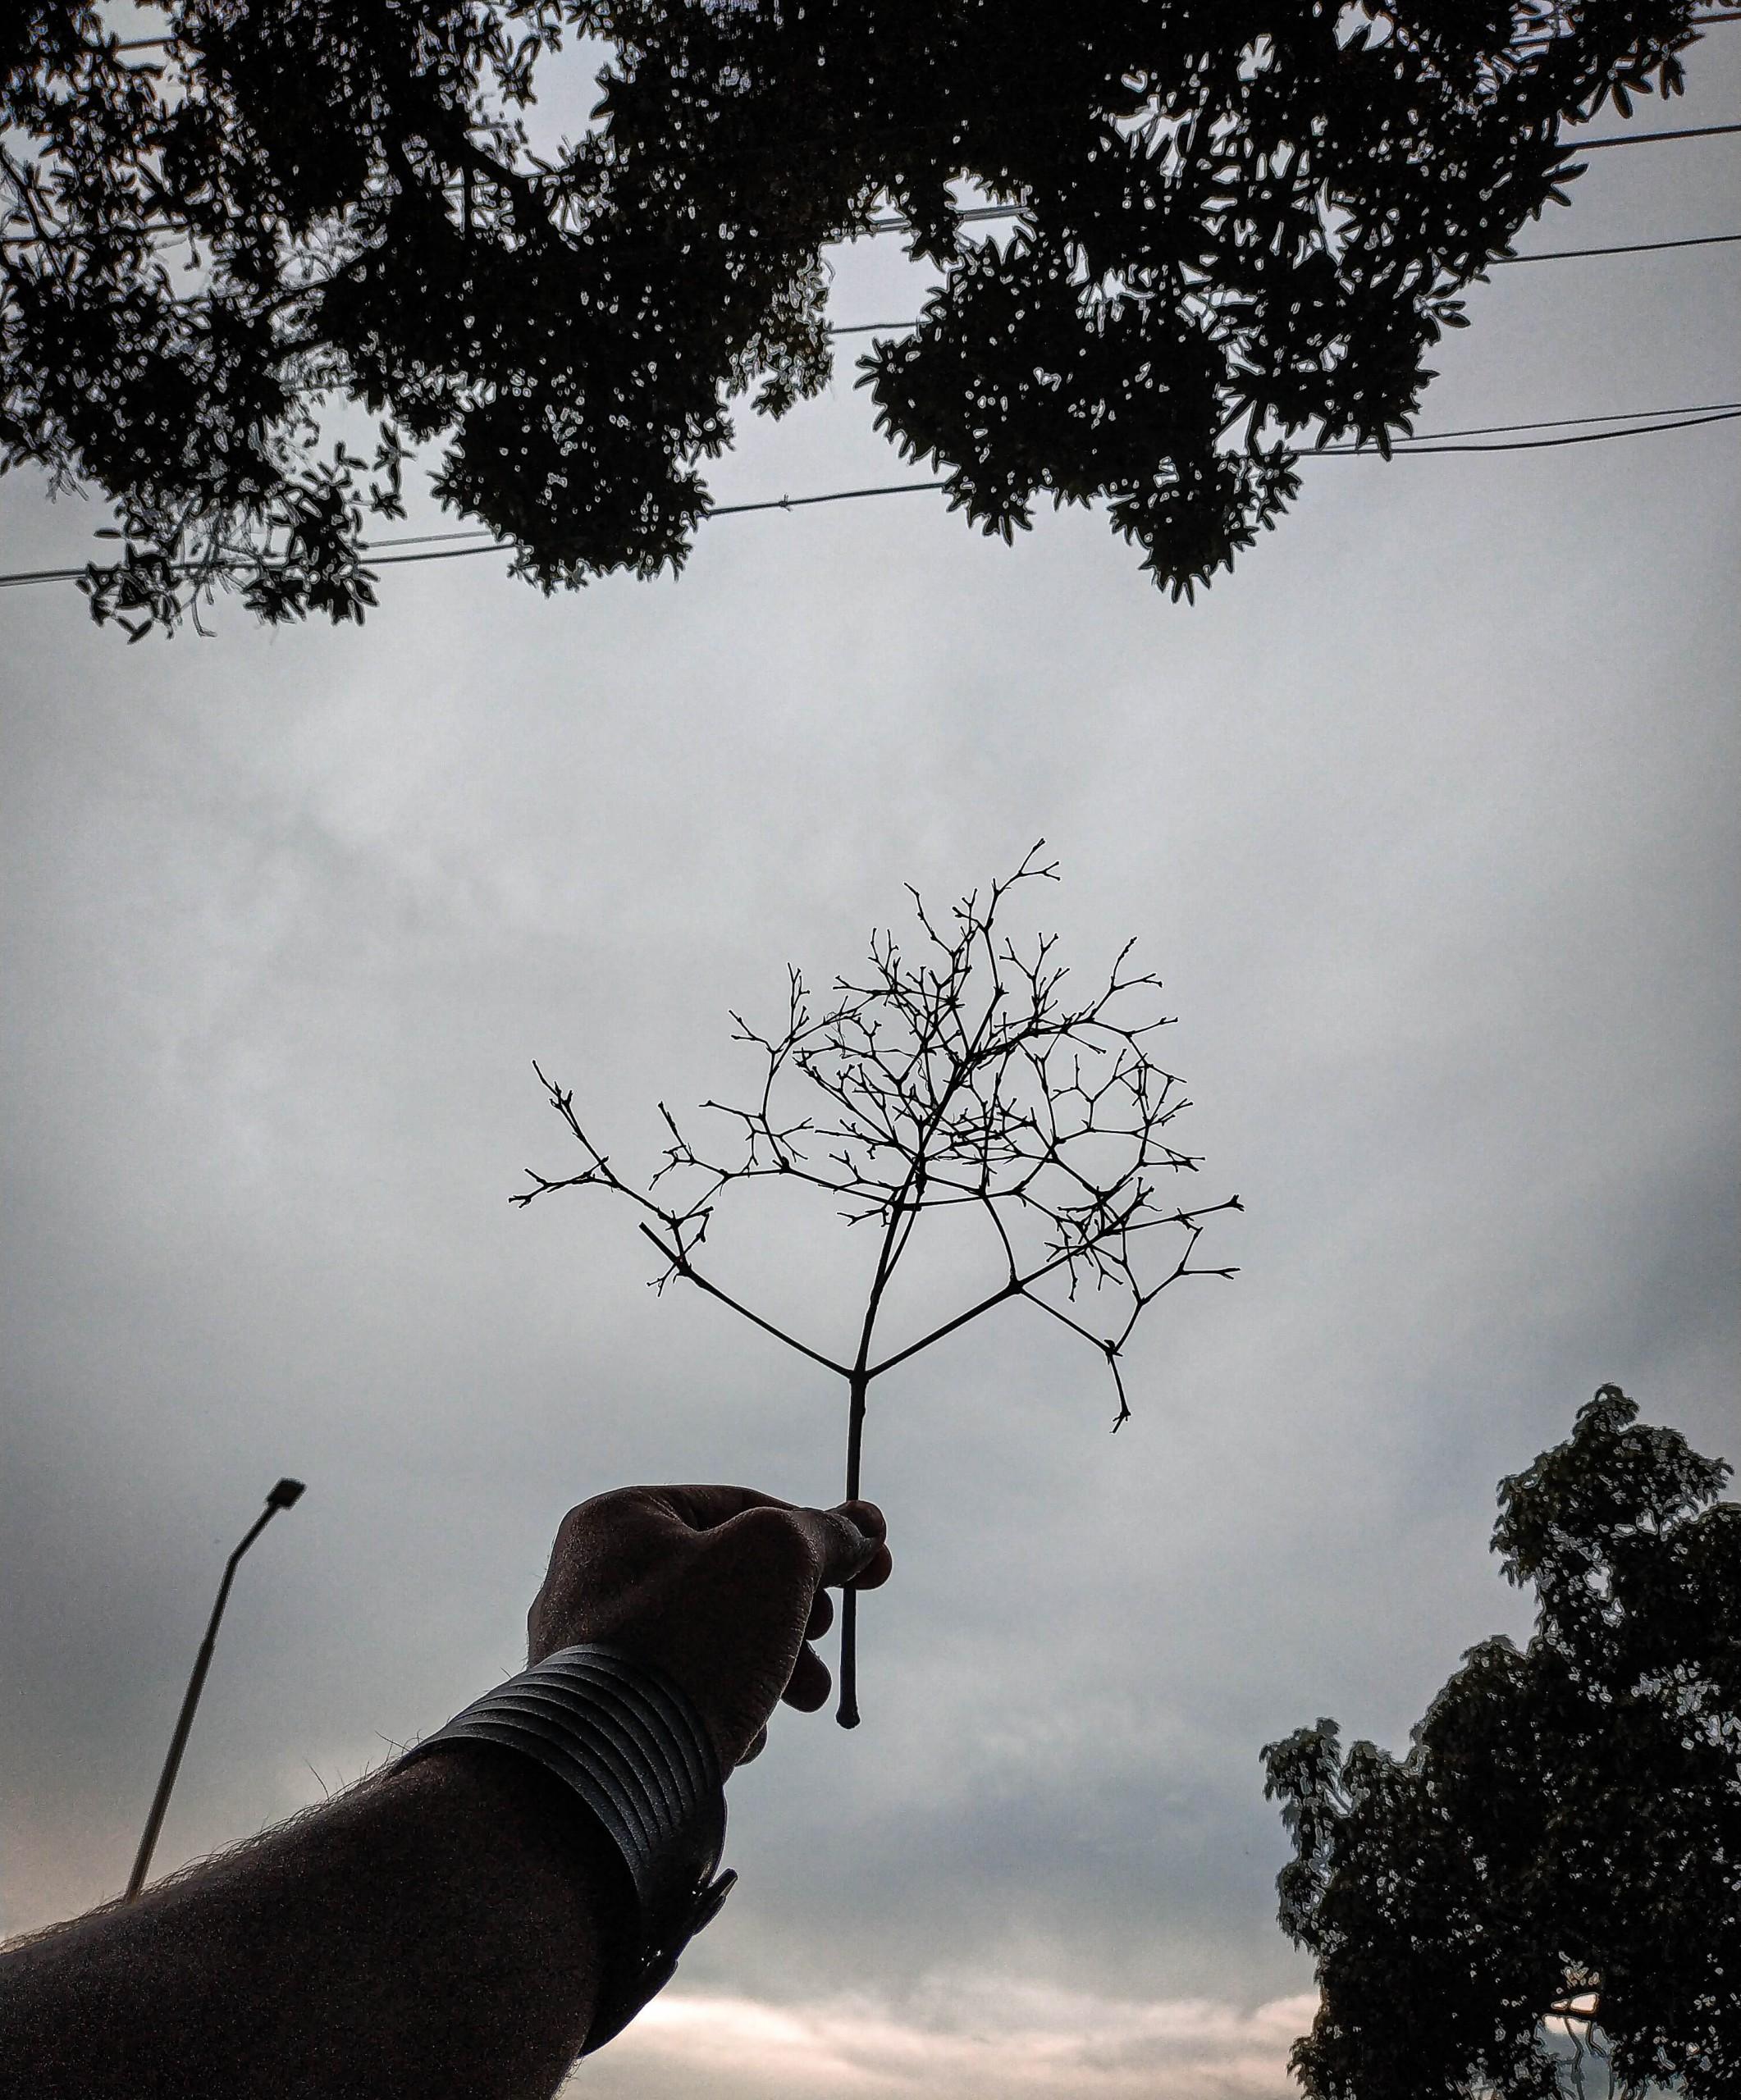 Hand Holding Tree Twigs